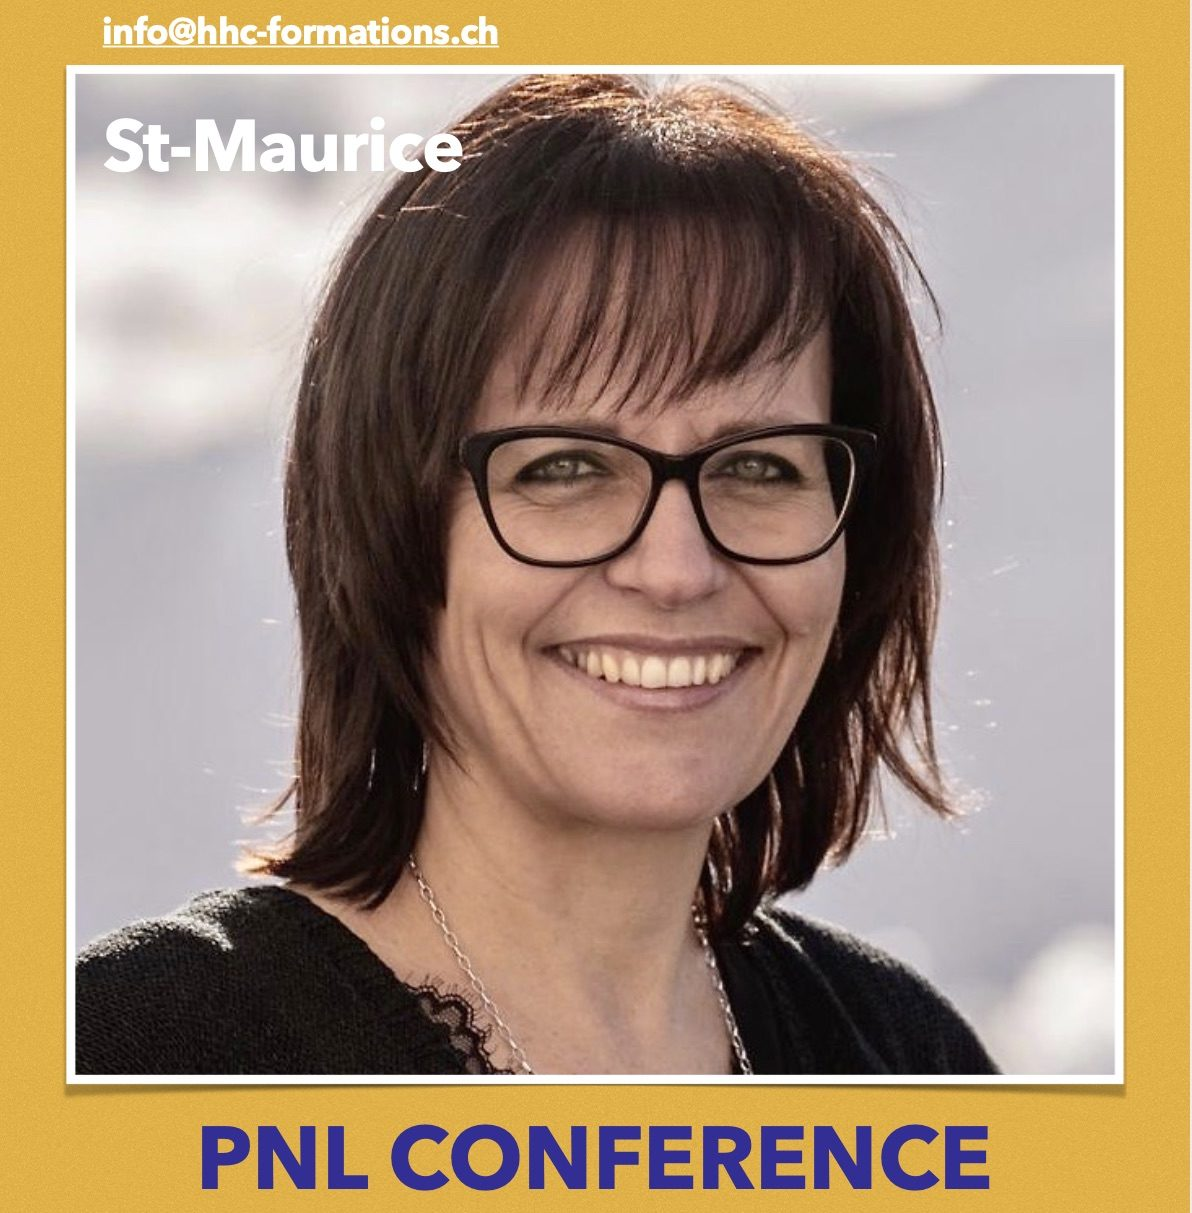 PNL, Conférence du 19 janvier 2021 à St-Maurice